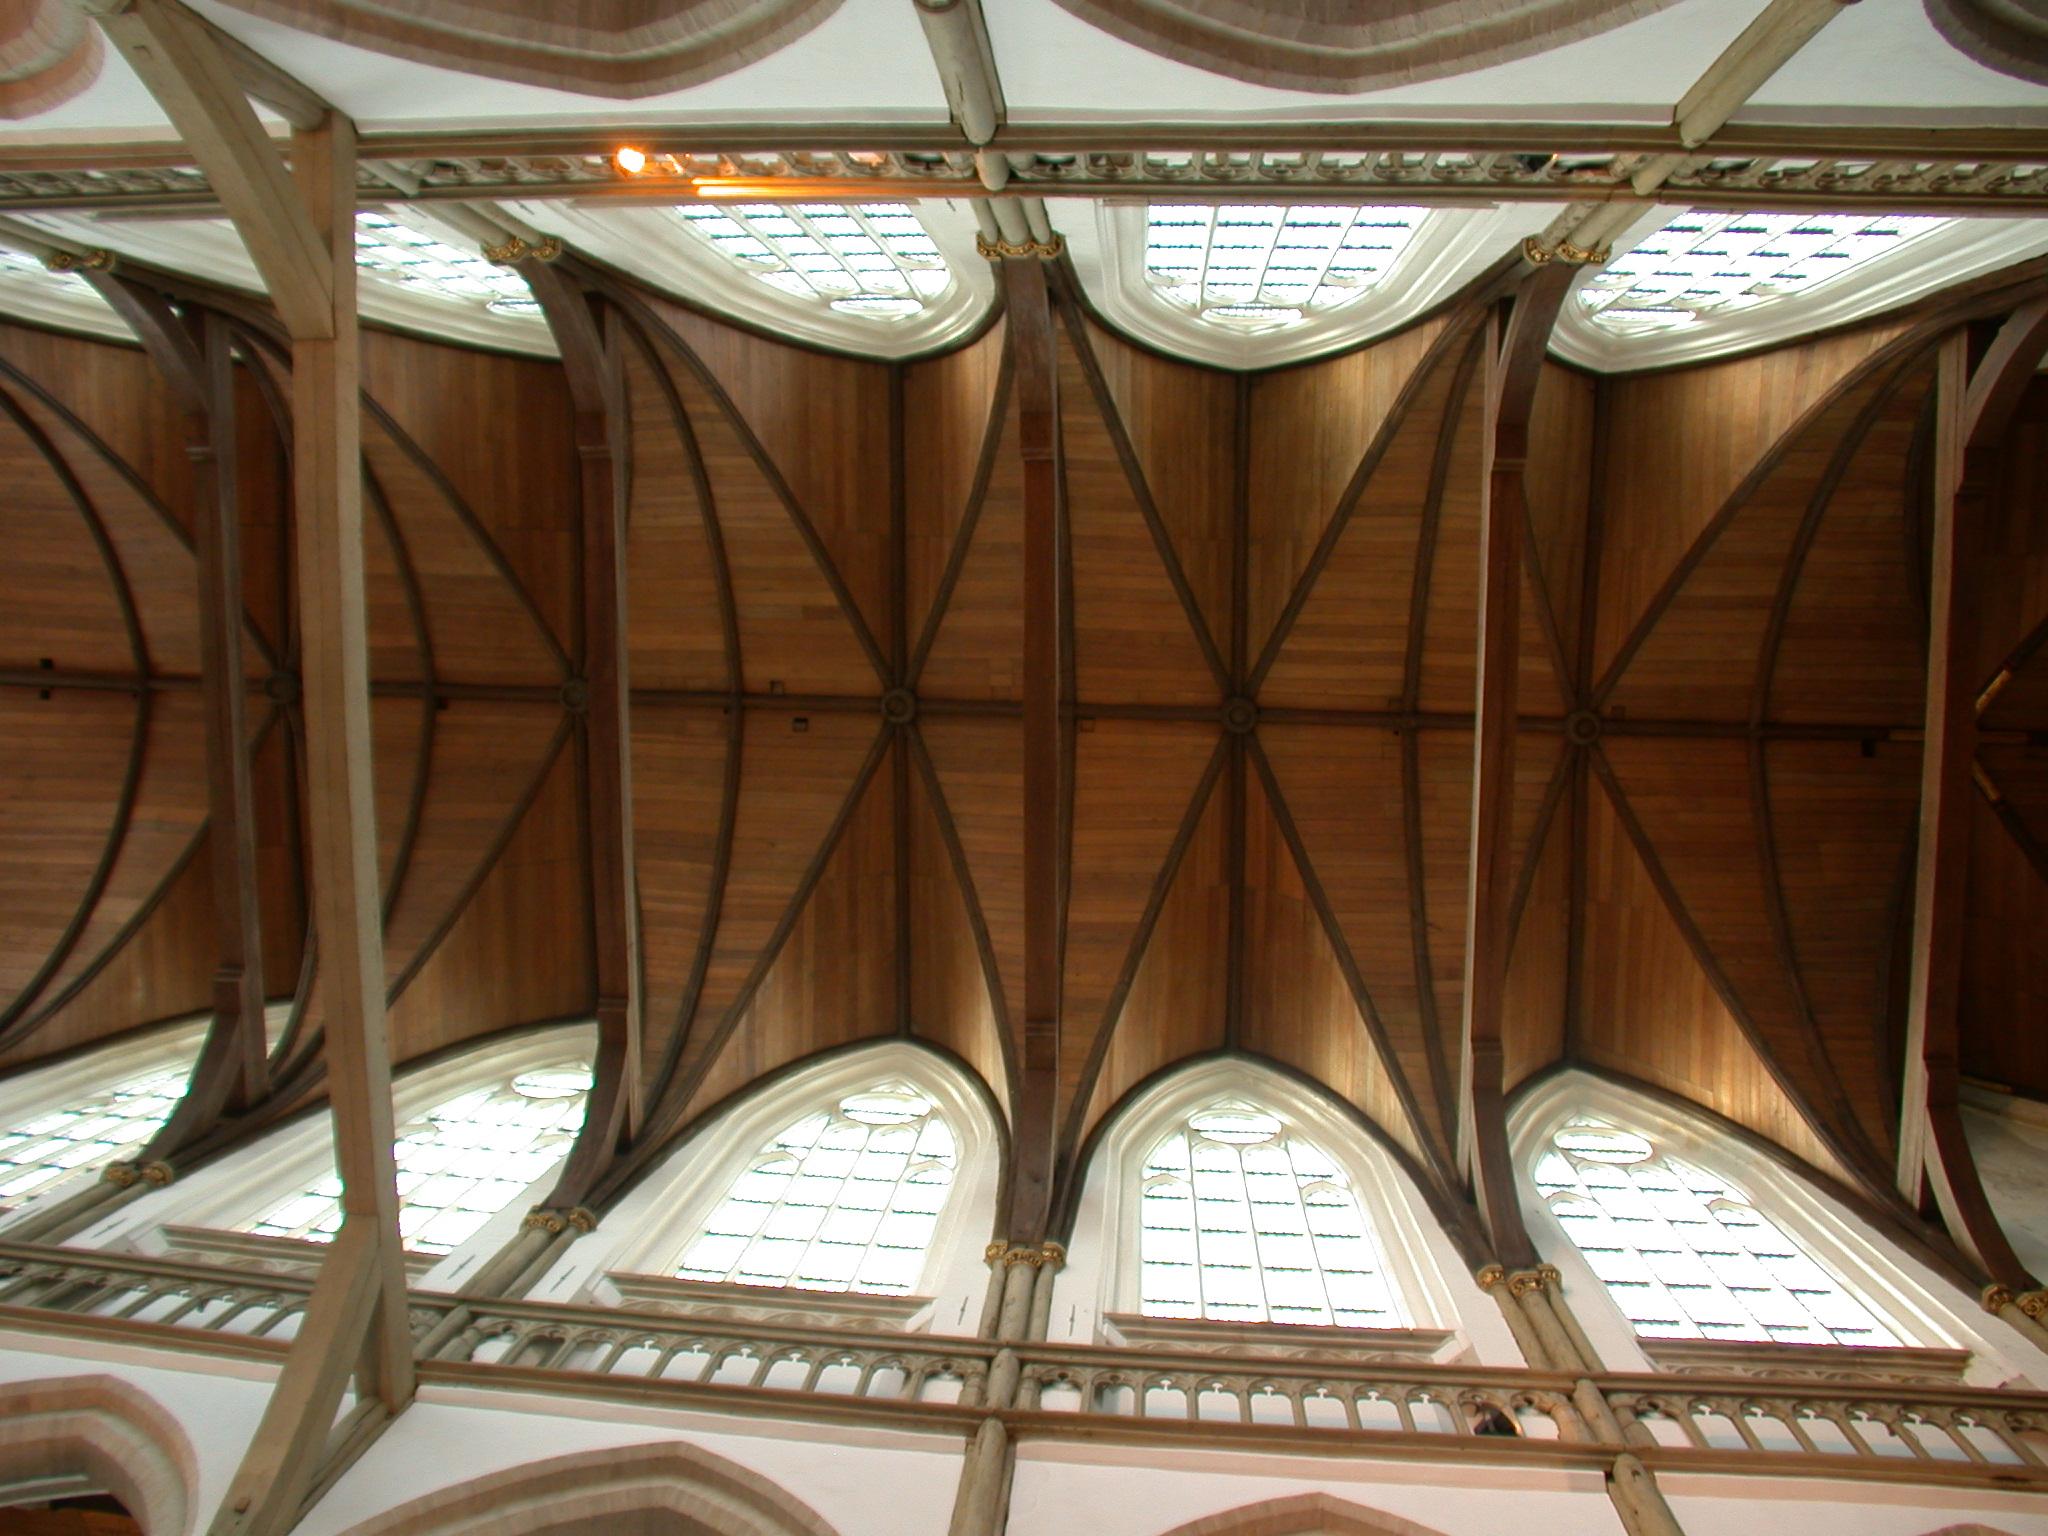 Church Roof Wood Beams Ceiling